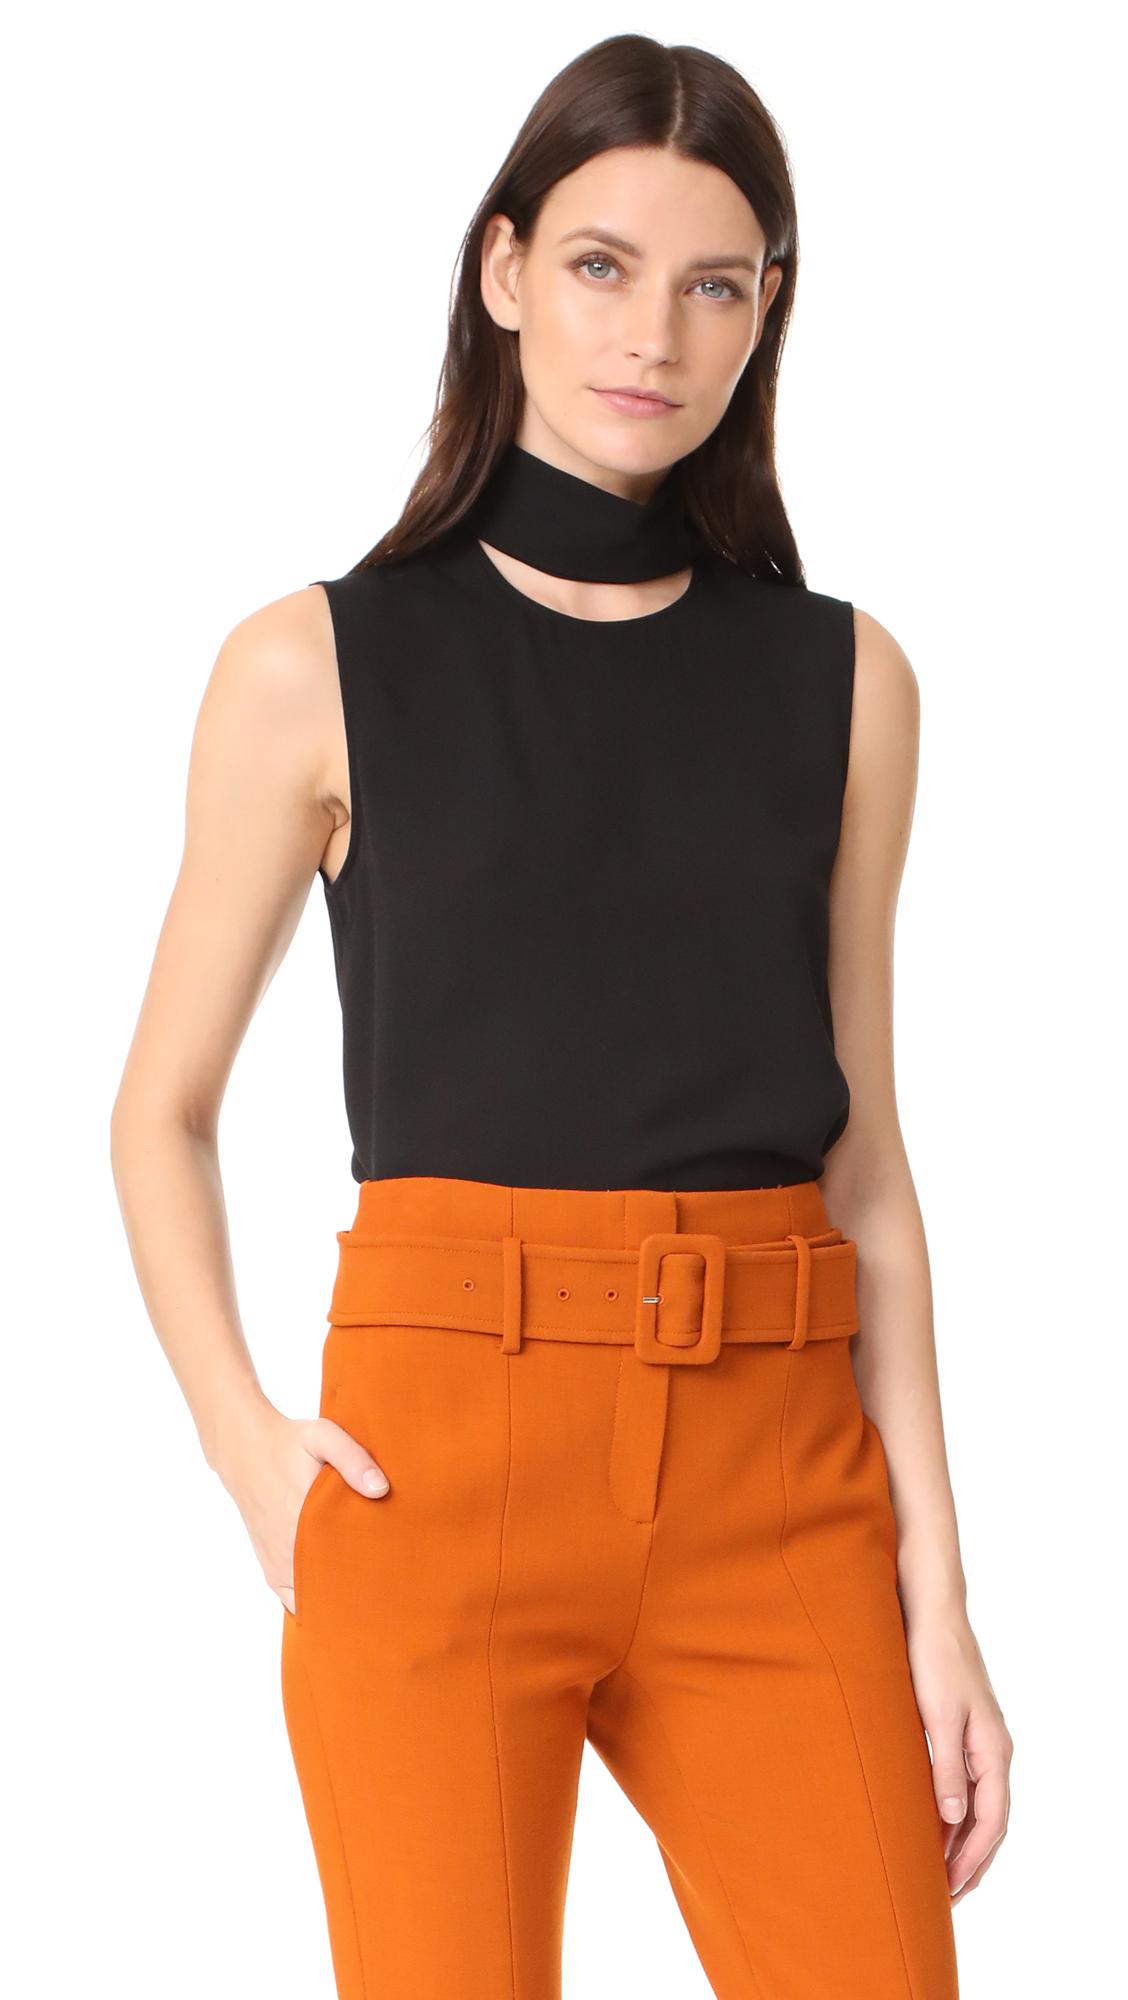 Theory Slit Collar Top - Black